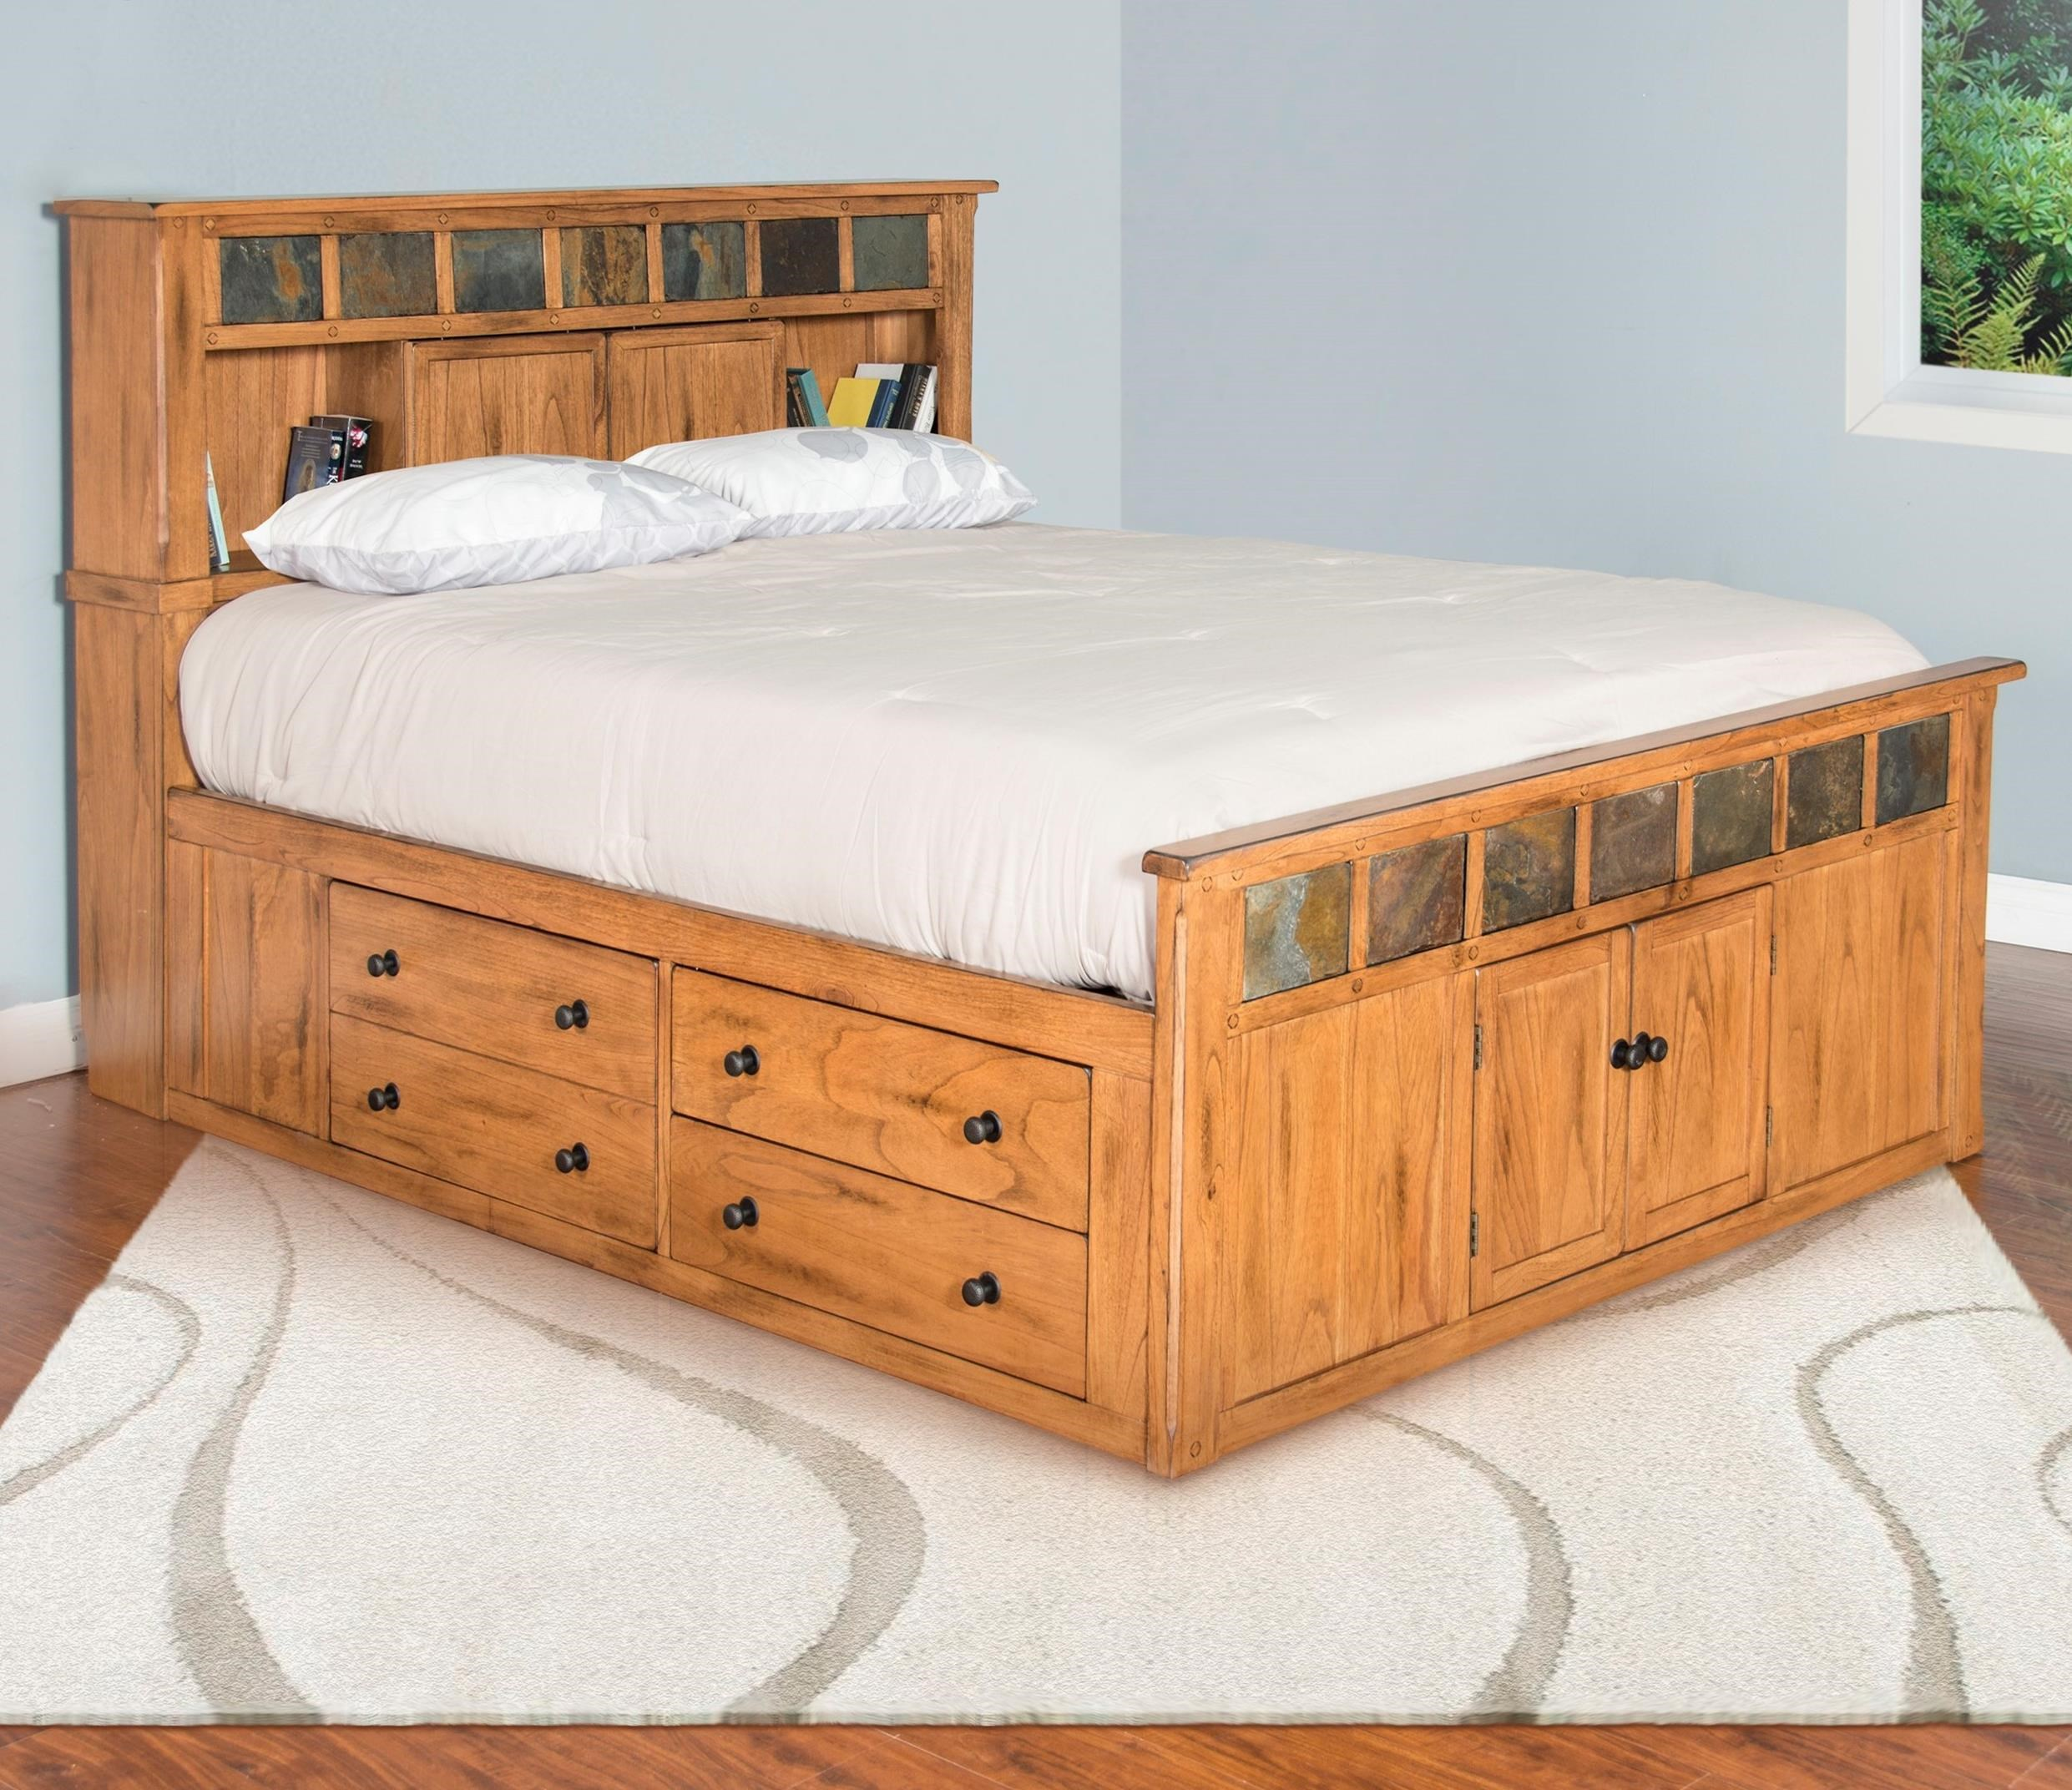 Sunny designs sedona queen storage bed w slate john v schultz furniture bookcase beds for Sunny designs bedroom furniture